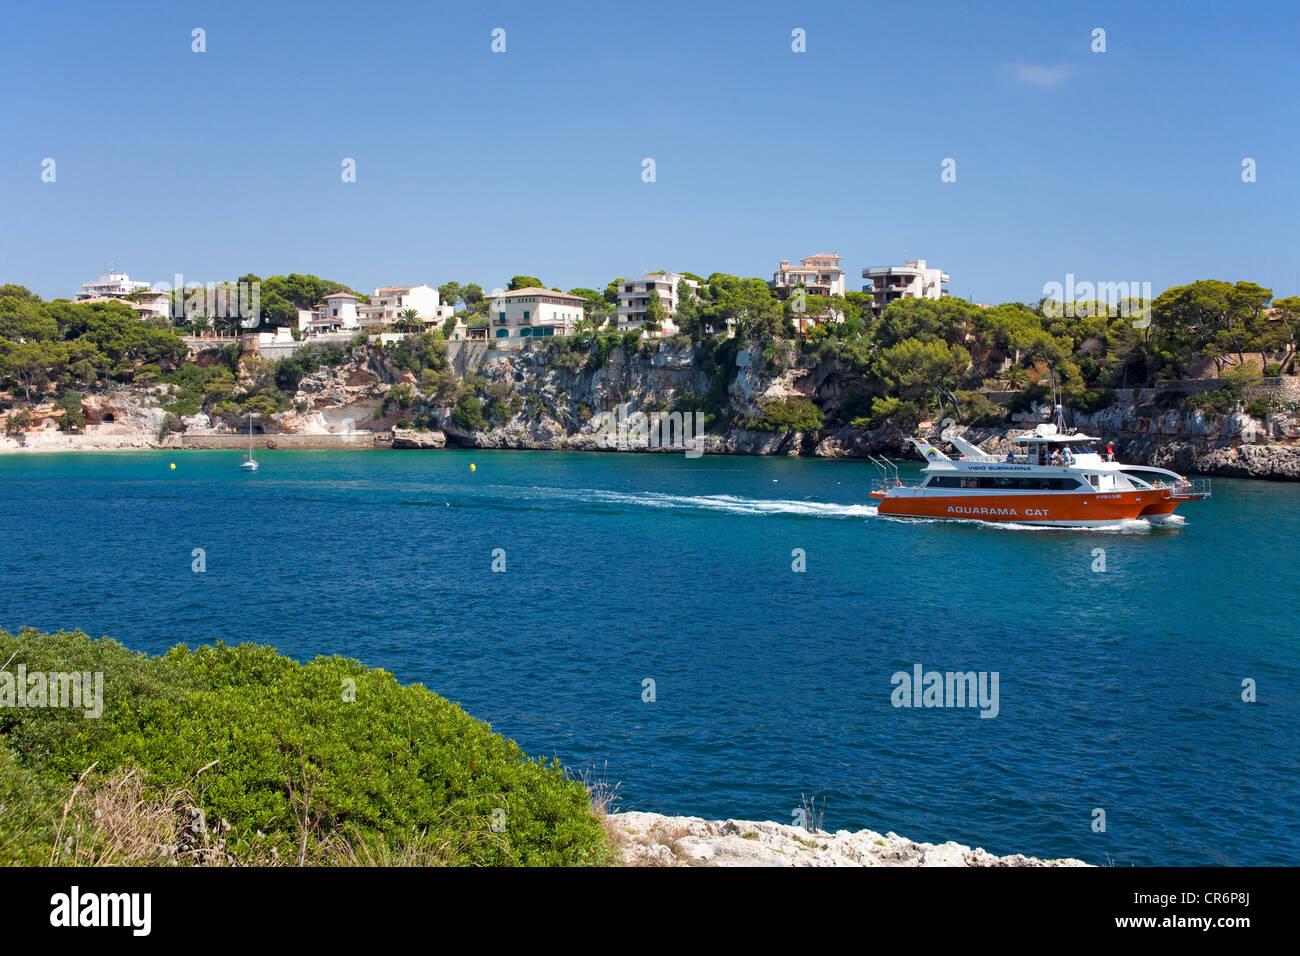 La sortie du port de plaisance de Porto Cristo, Majorque, îles Baléares, Espagne, Mer Méditerranée, Photo Stock